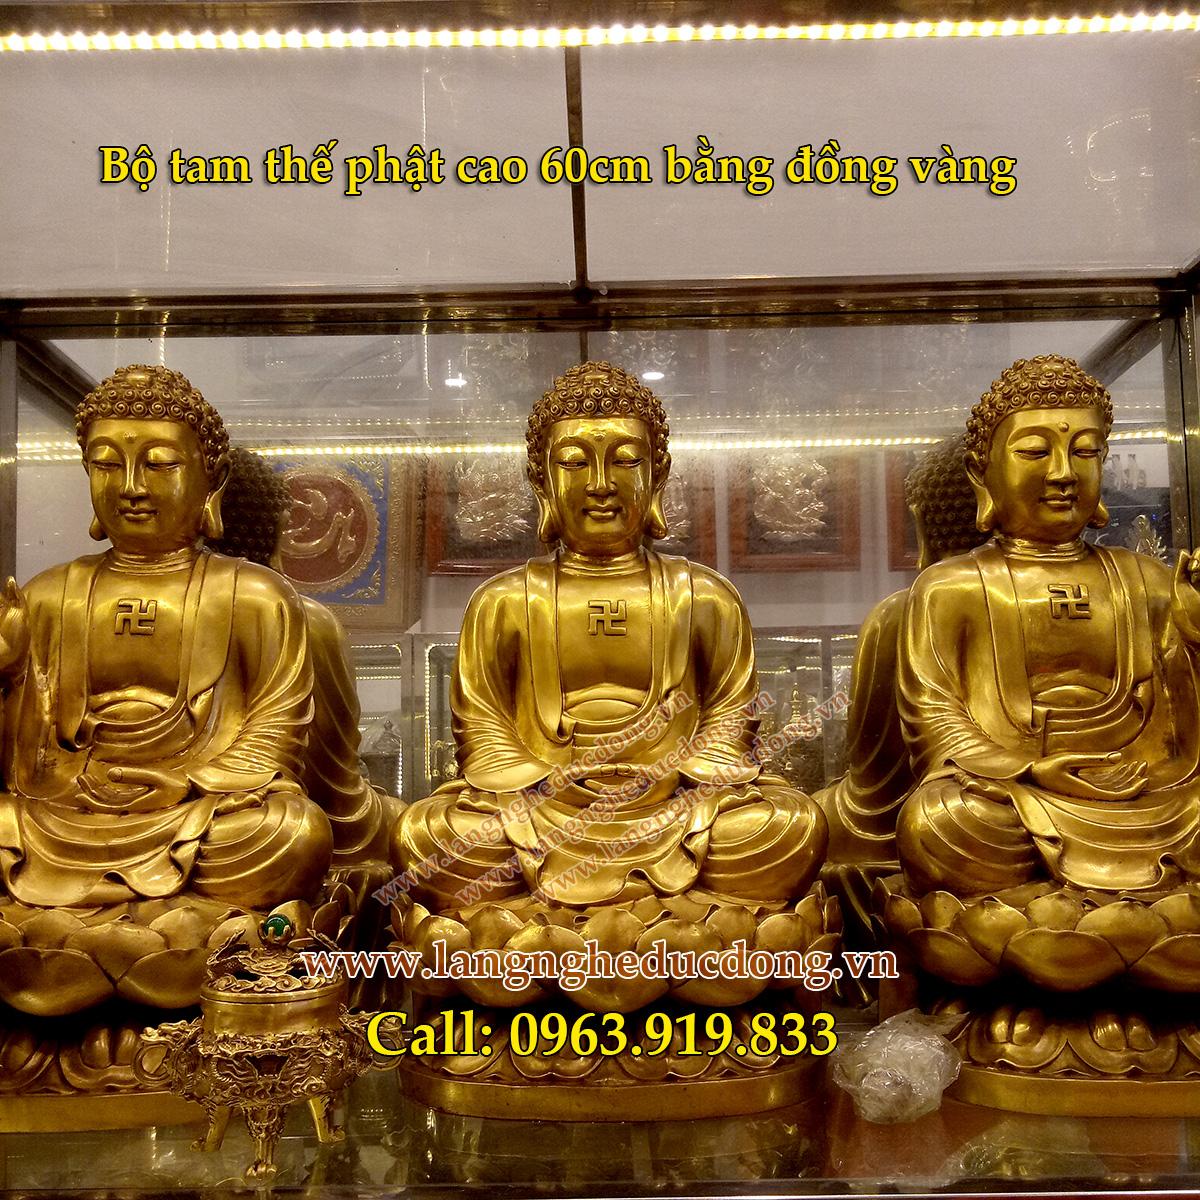 langngheducdong.vn - Tam thế Phật, tượng phật bằng đồng, bộ tam thế phật cao 60cm